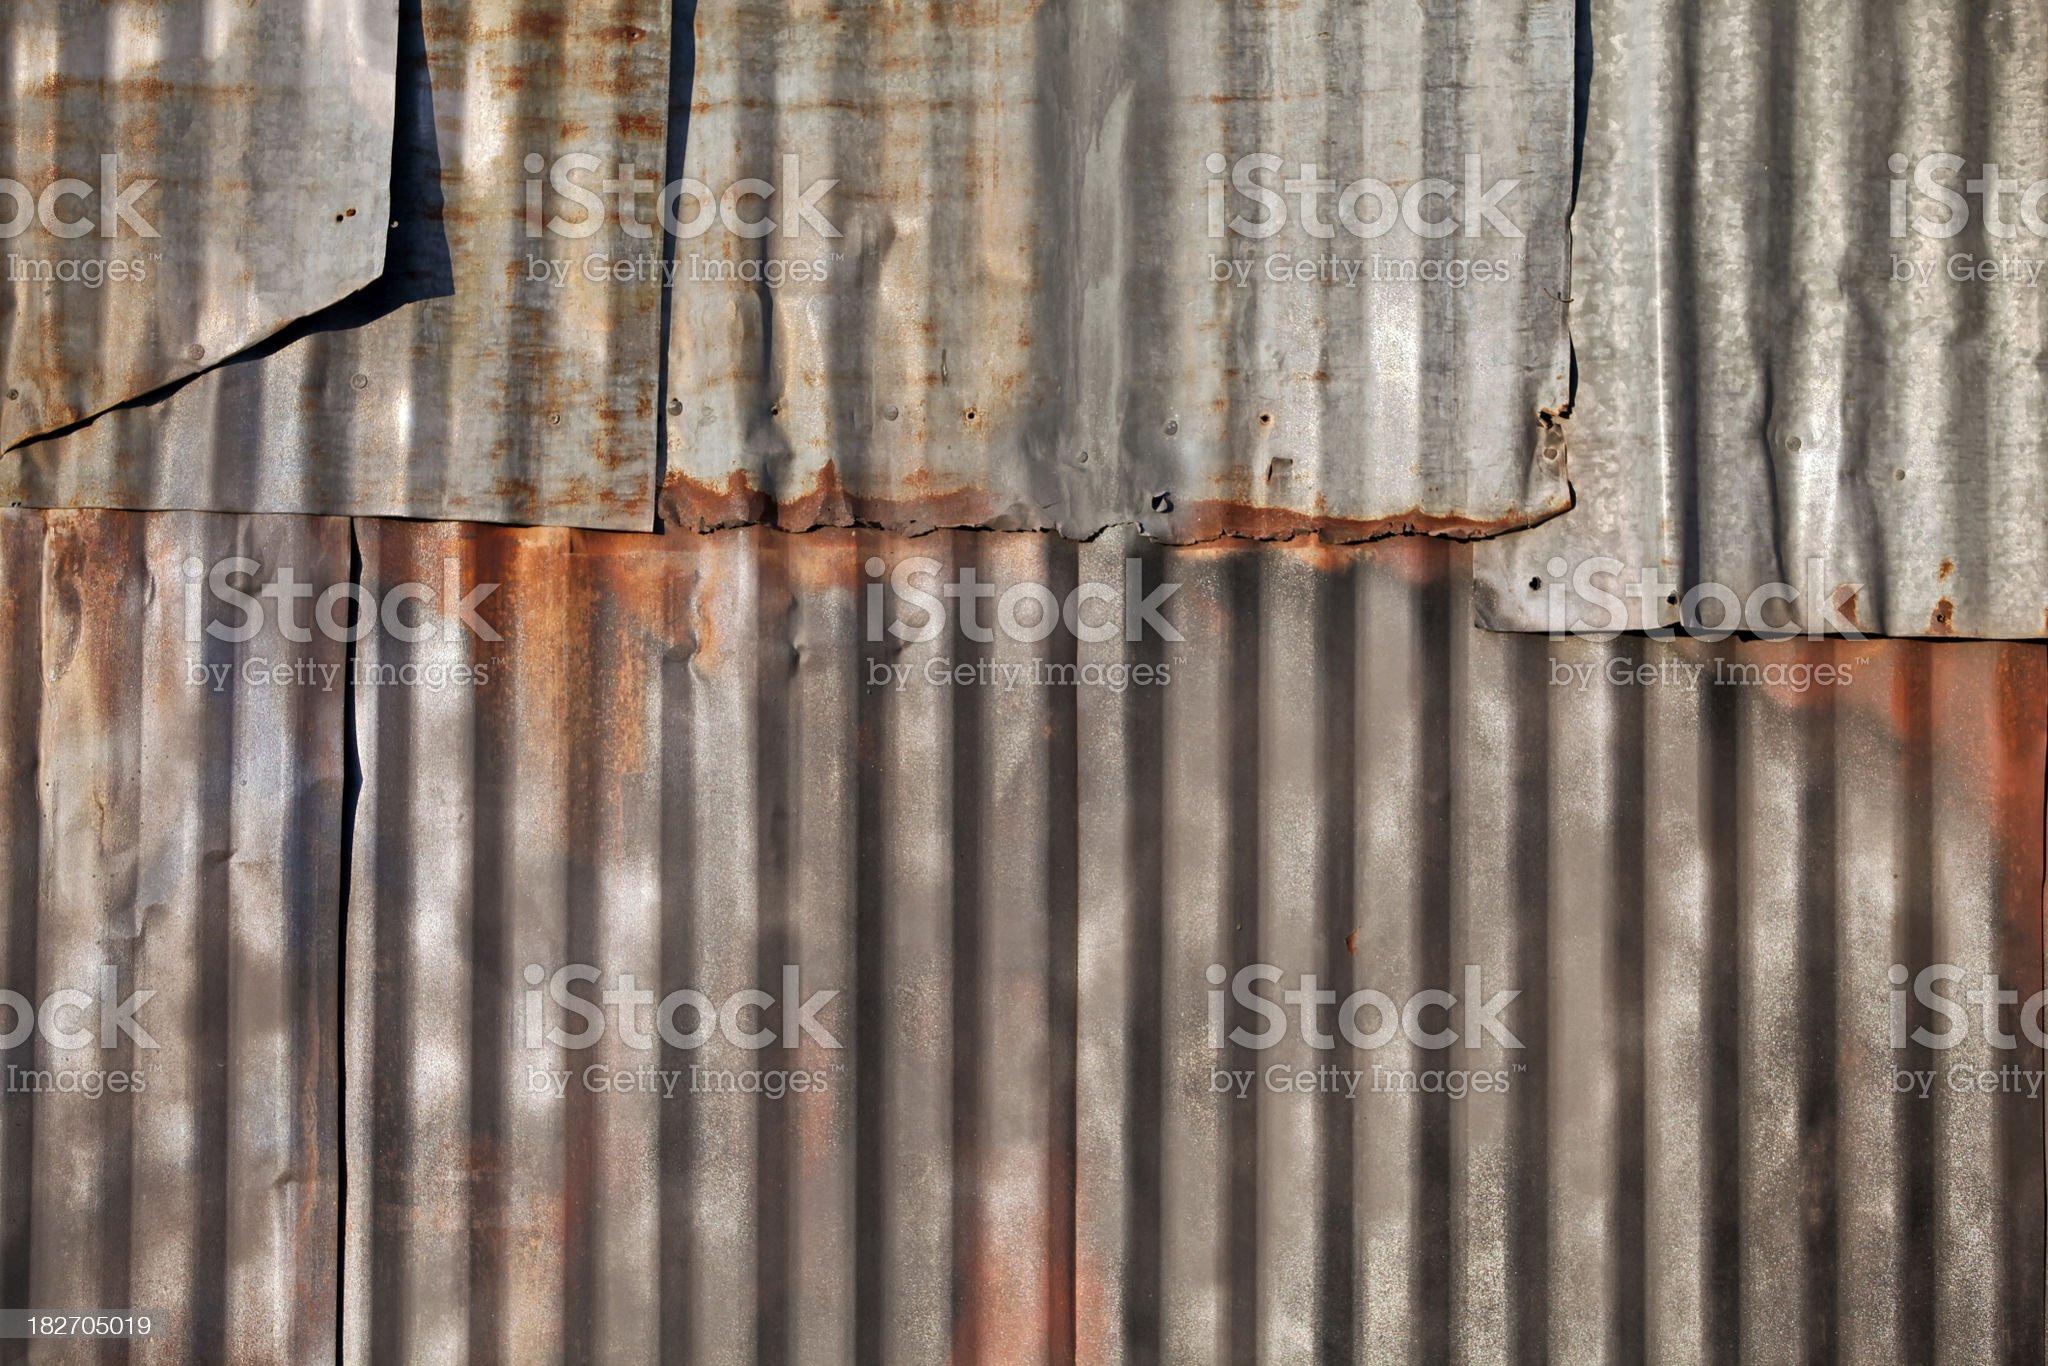 Old Corrugated Steel Siding royalty-free stock photo